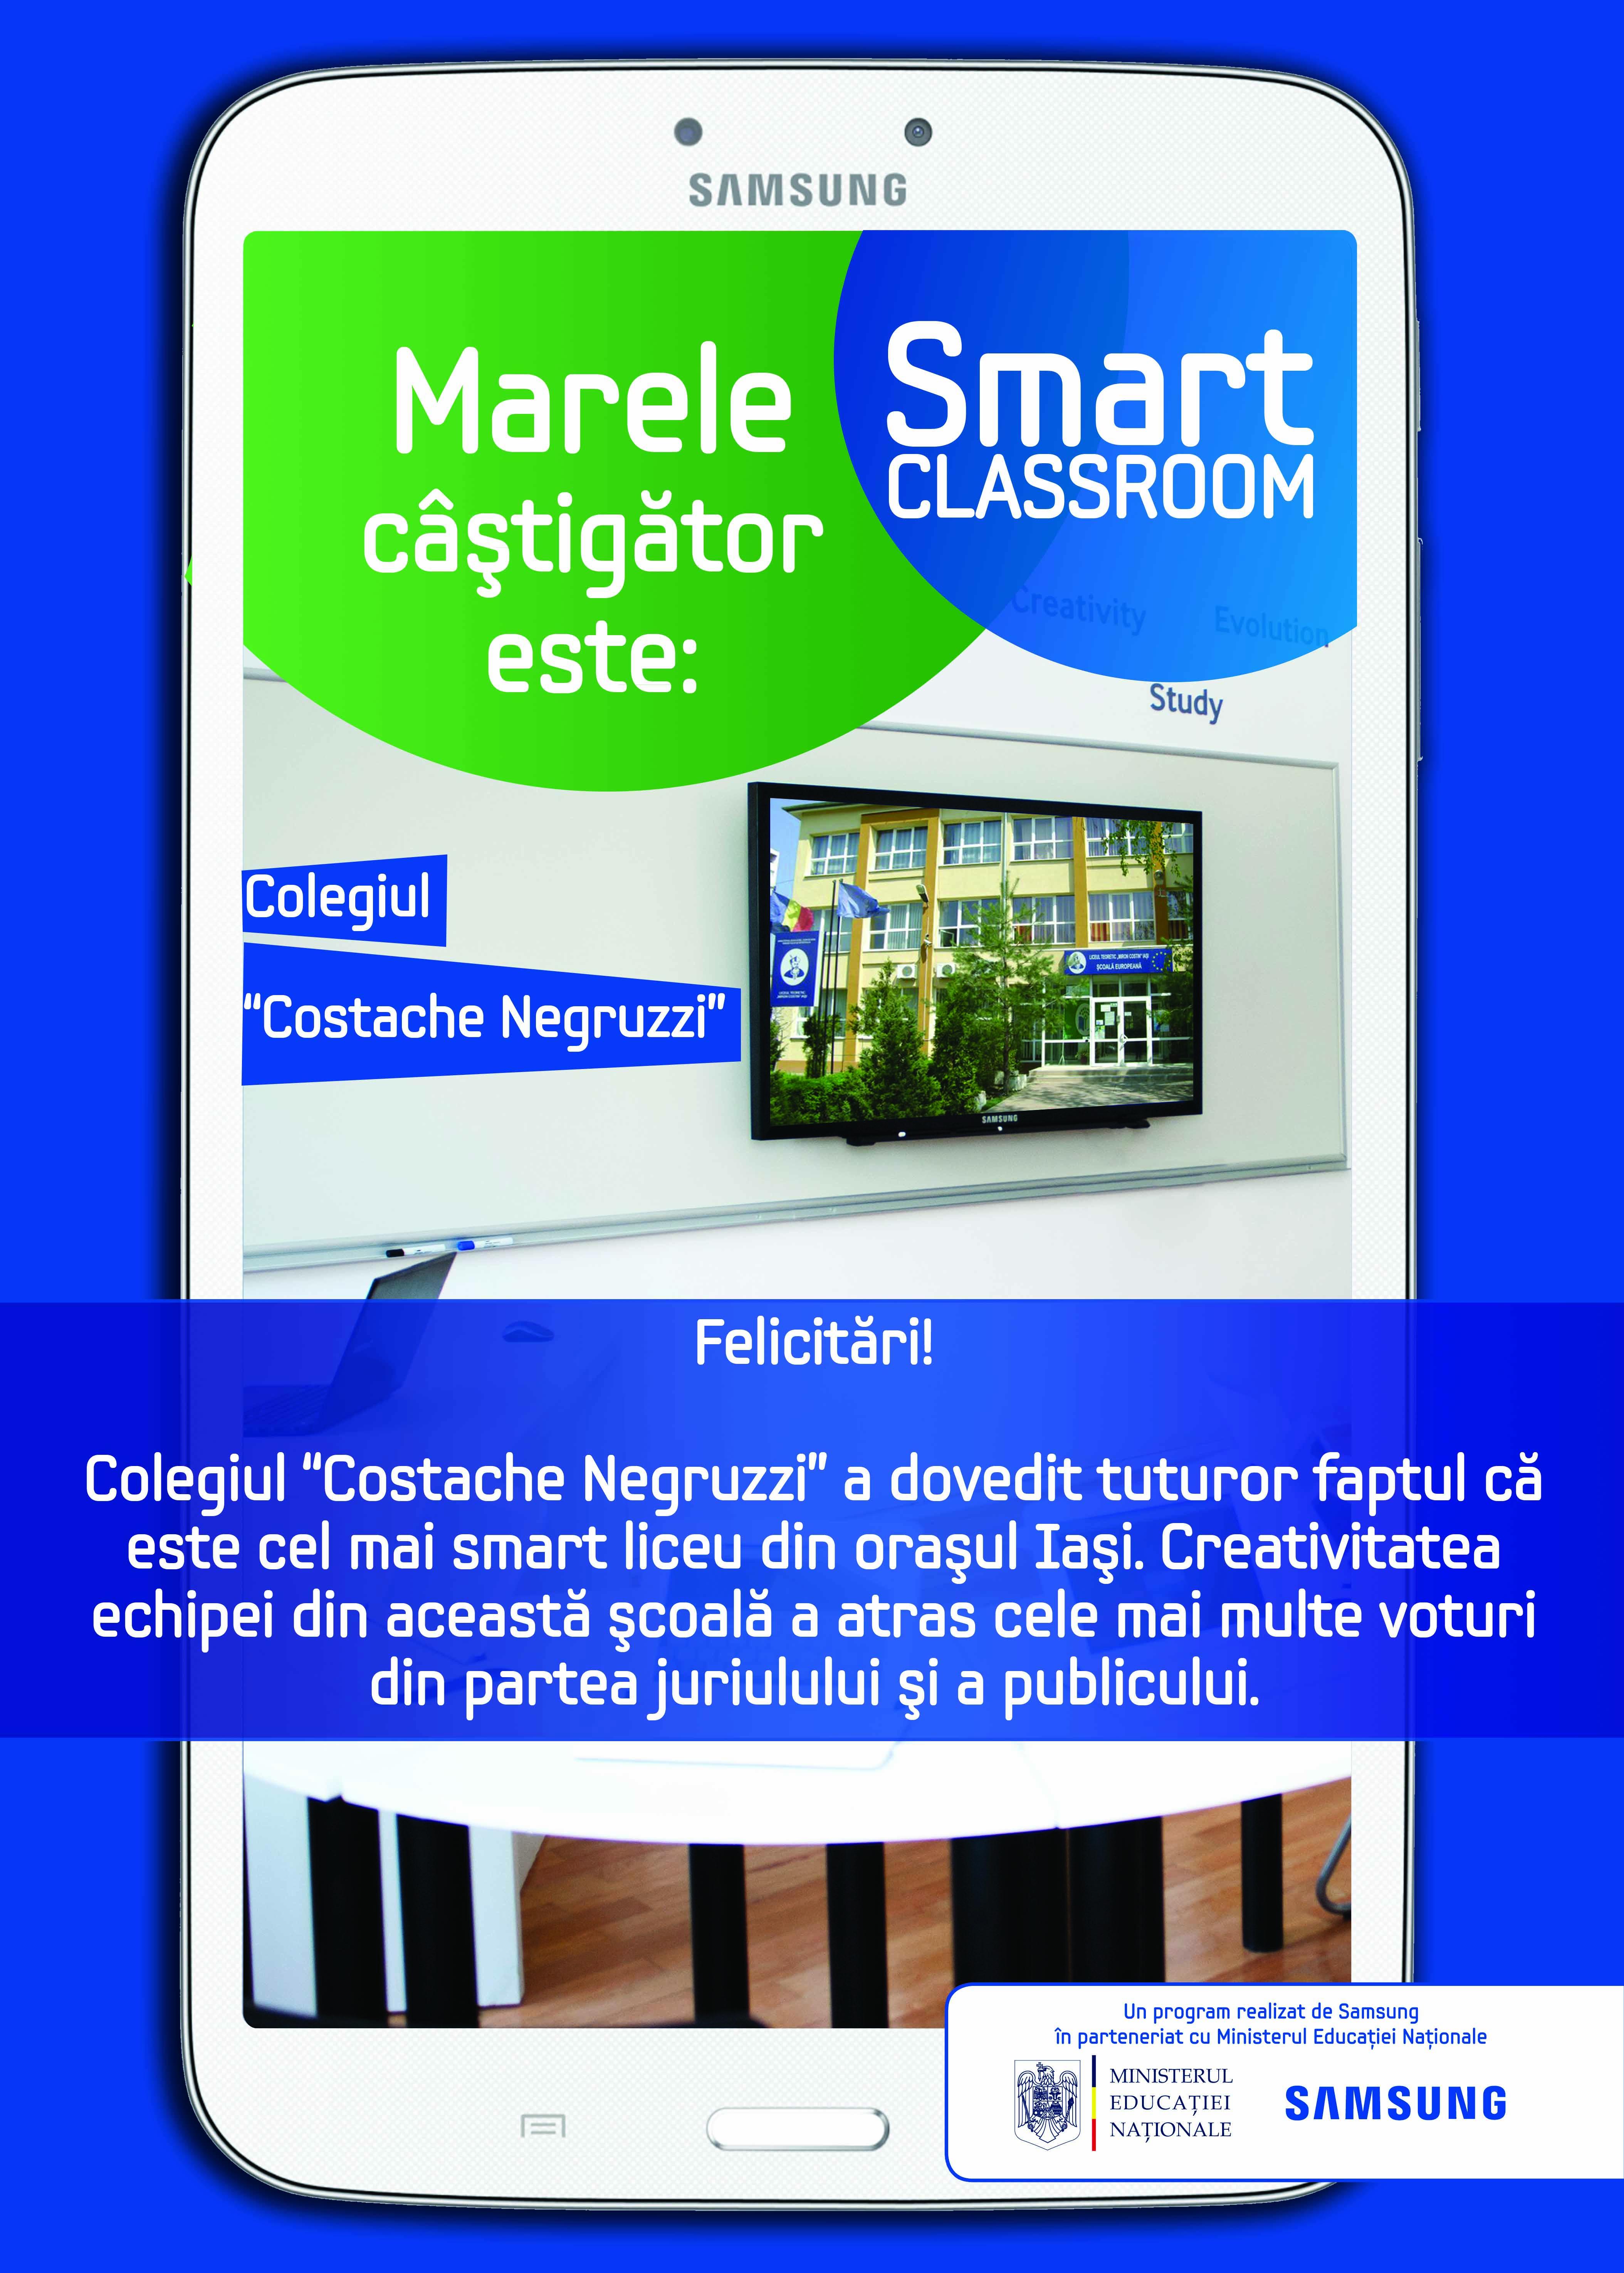 "Colegiul ""Costache Negruzzi""castiga competitia Smart Classroom din Iasi"